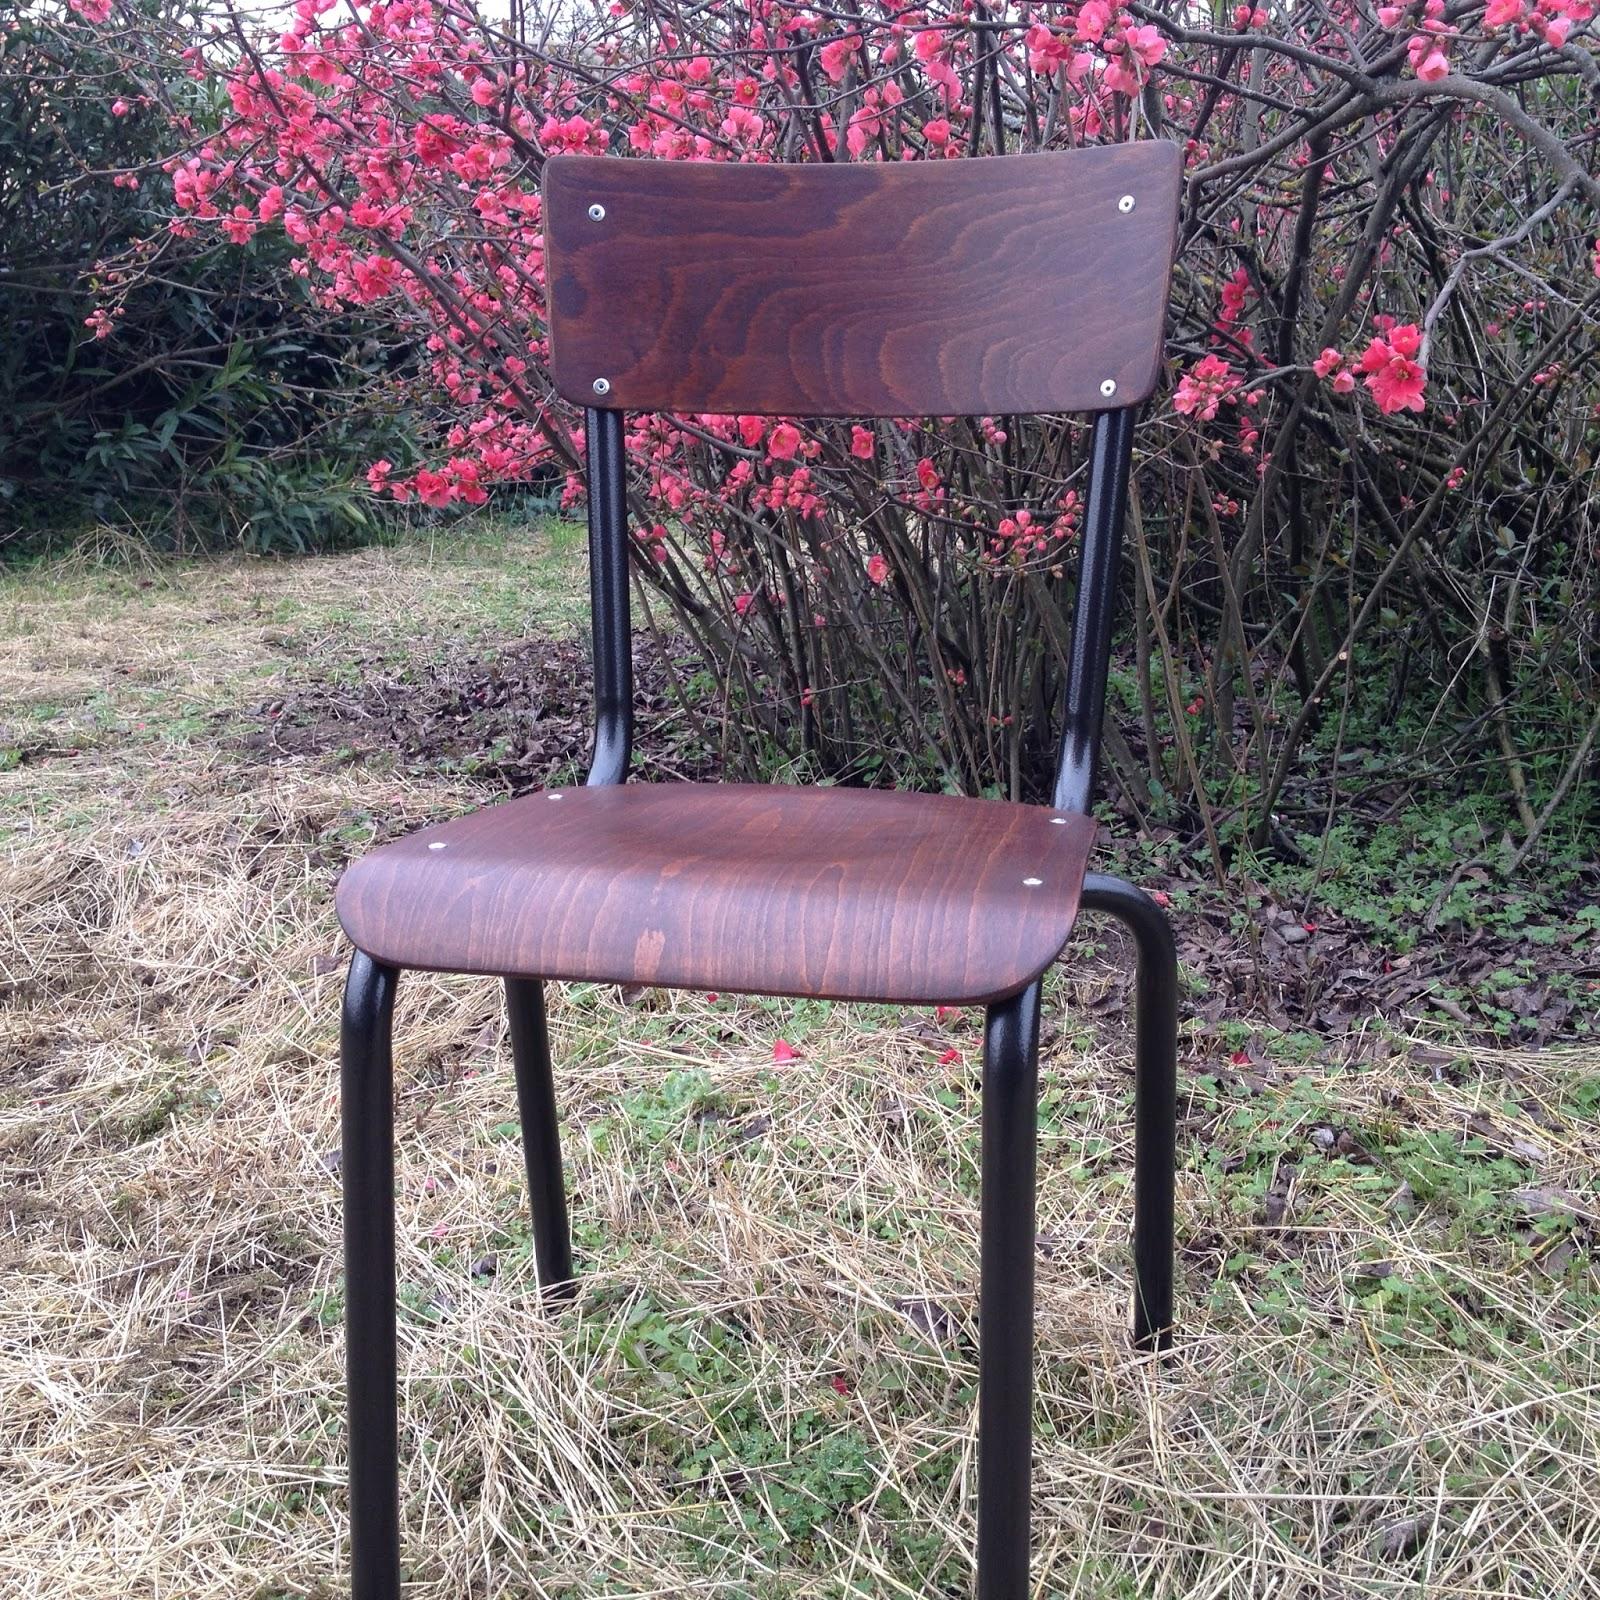 mullca 511 la chaise. Black Bedroom Furniture Sets. Home Design Ideas